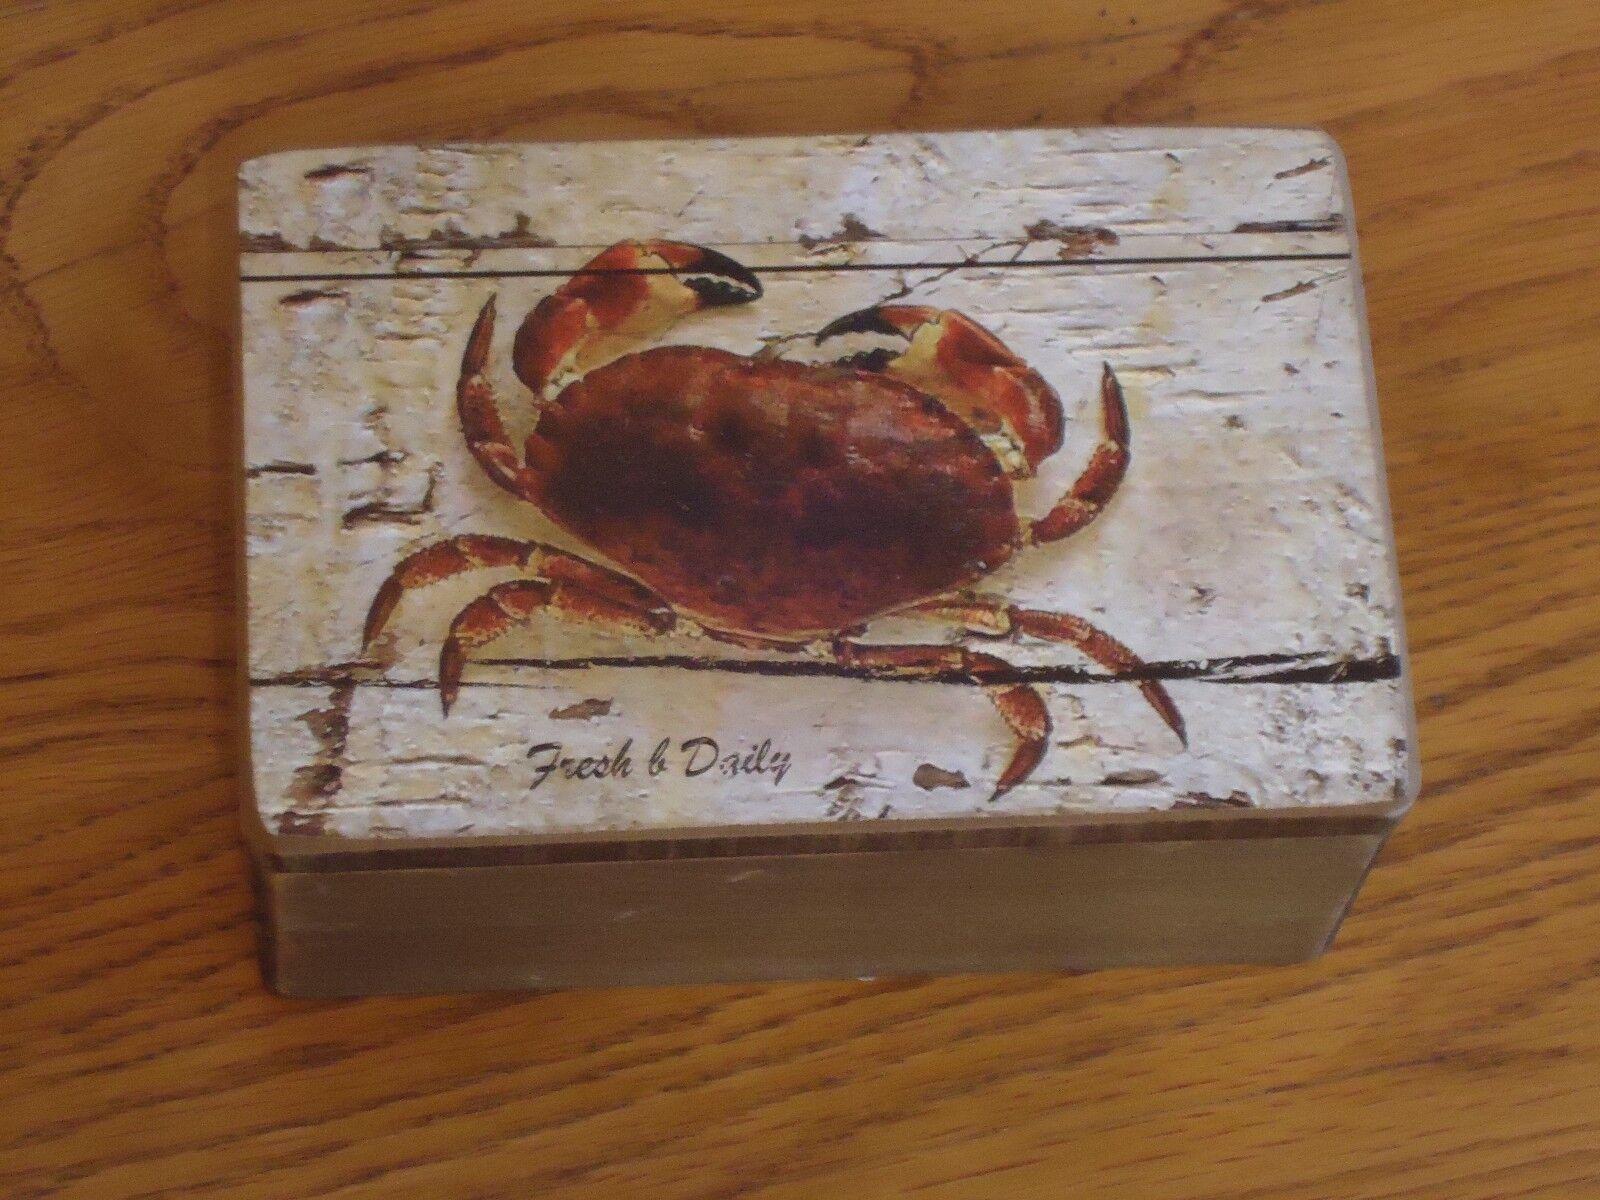 Picture Nautical Trinket Sea Crab Wooden Box Treasure Chest Shell Fish